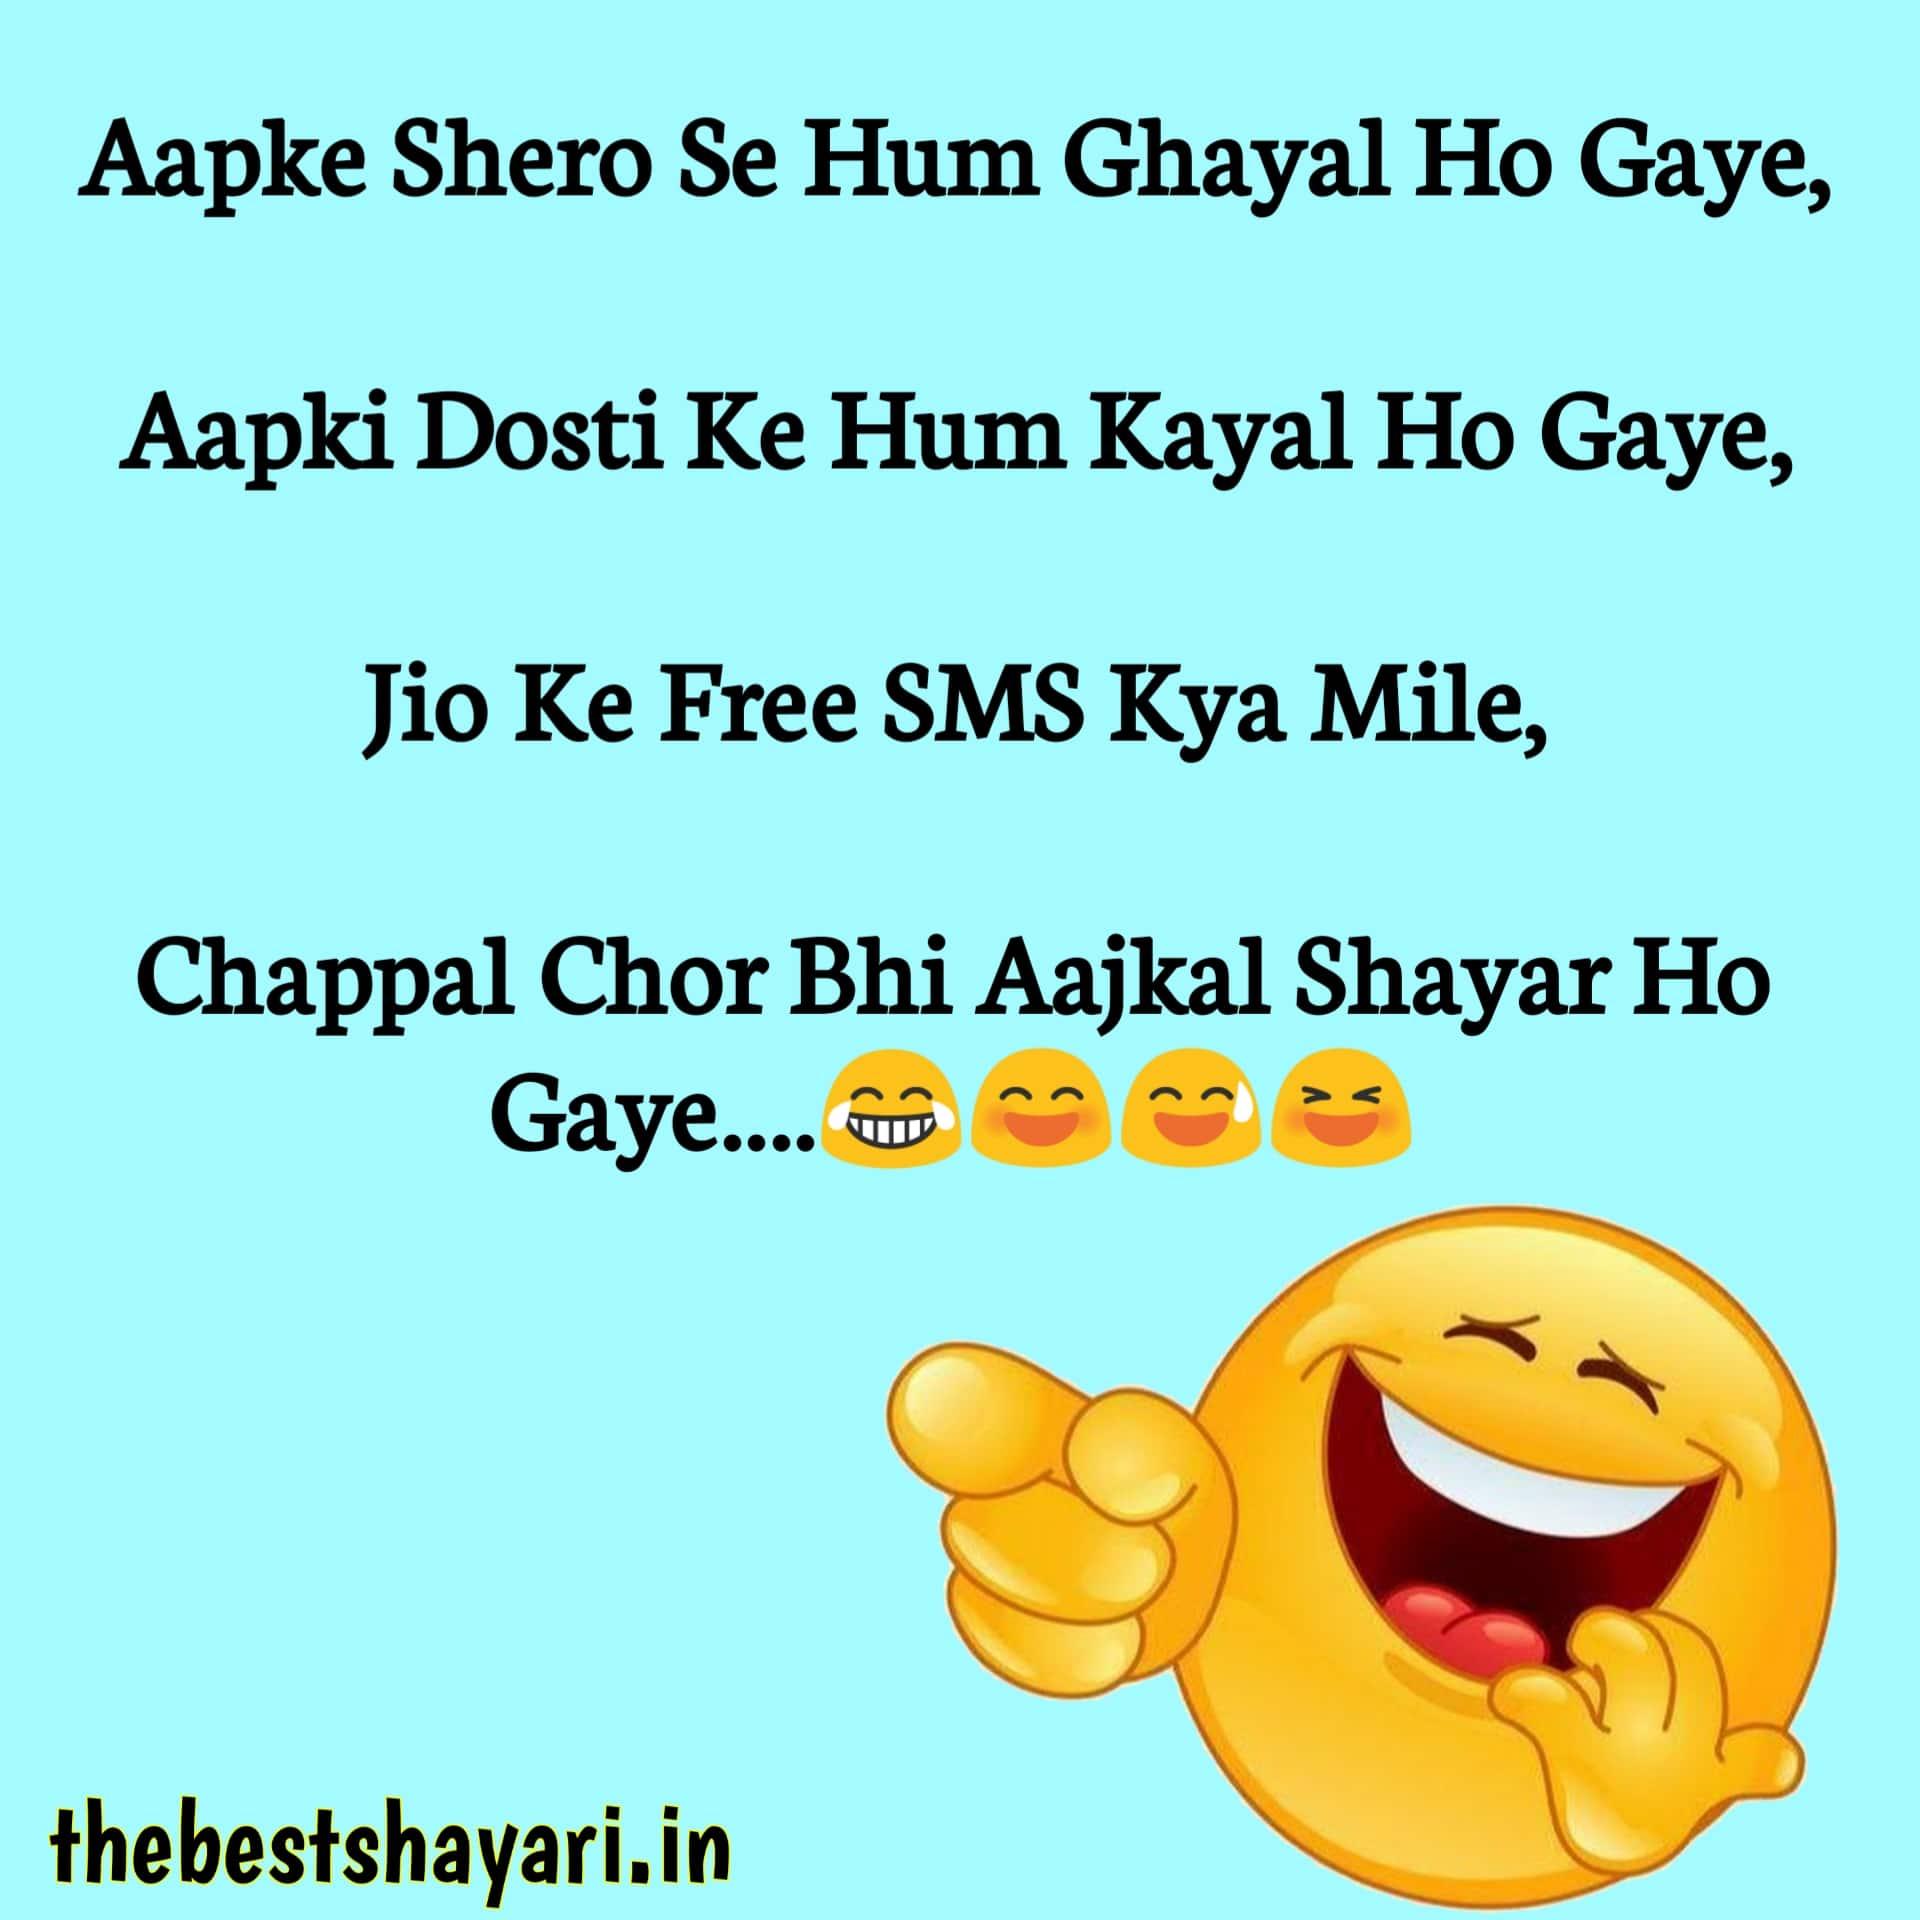 Funny shayari for friends in English